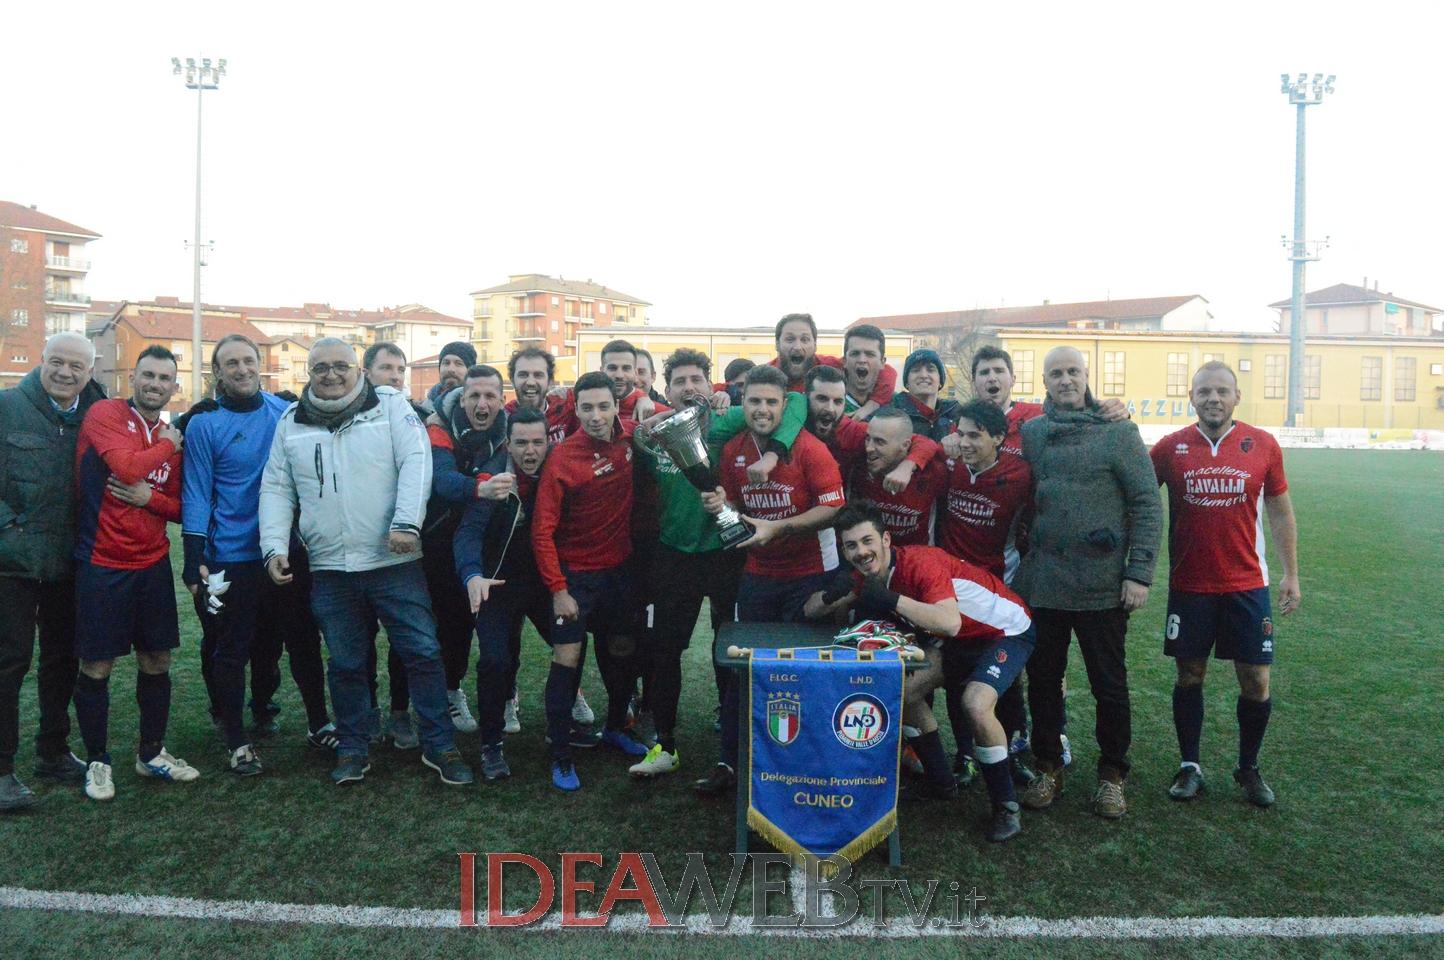 Calendario Terza Categoria.Coppa Seconda E Terza Categoria 8 Cuneesi In Corsa Ecco